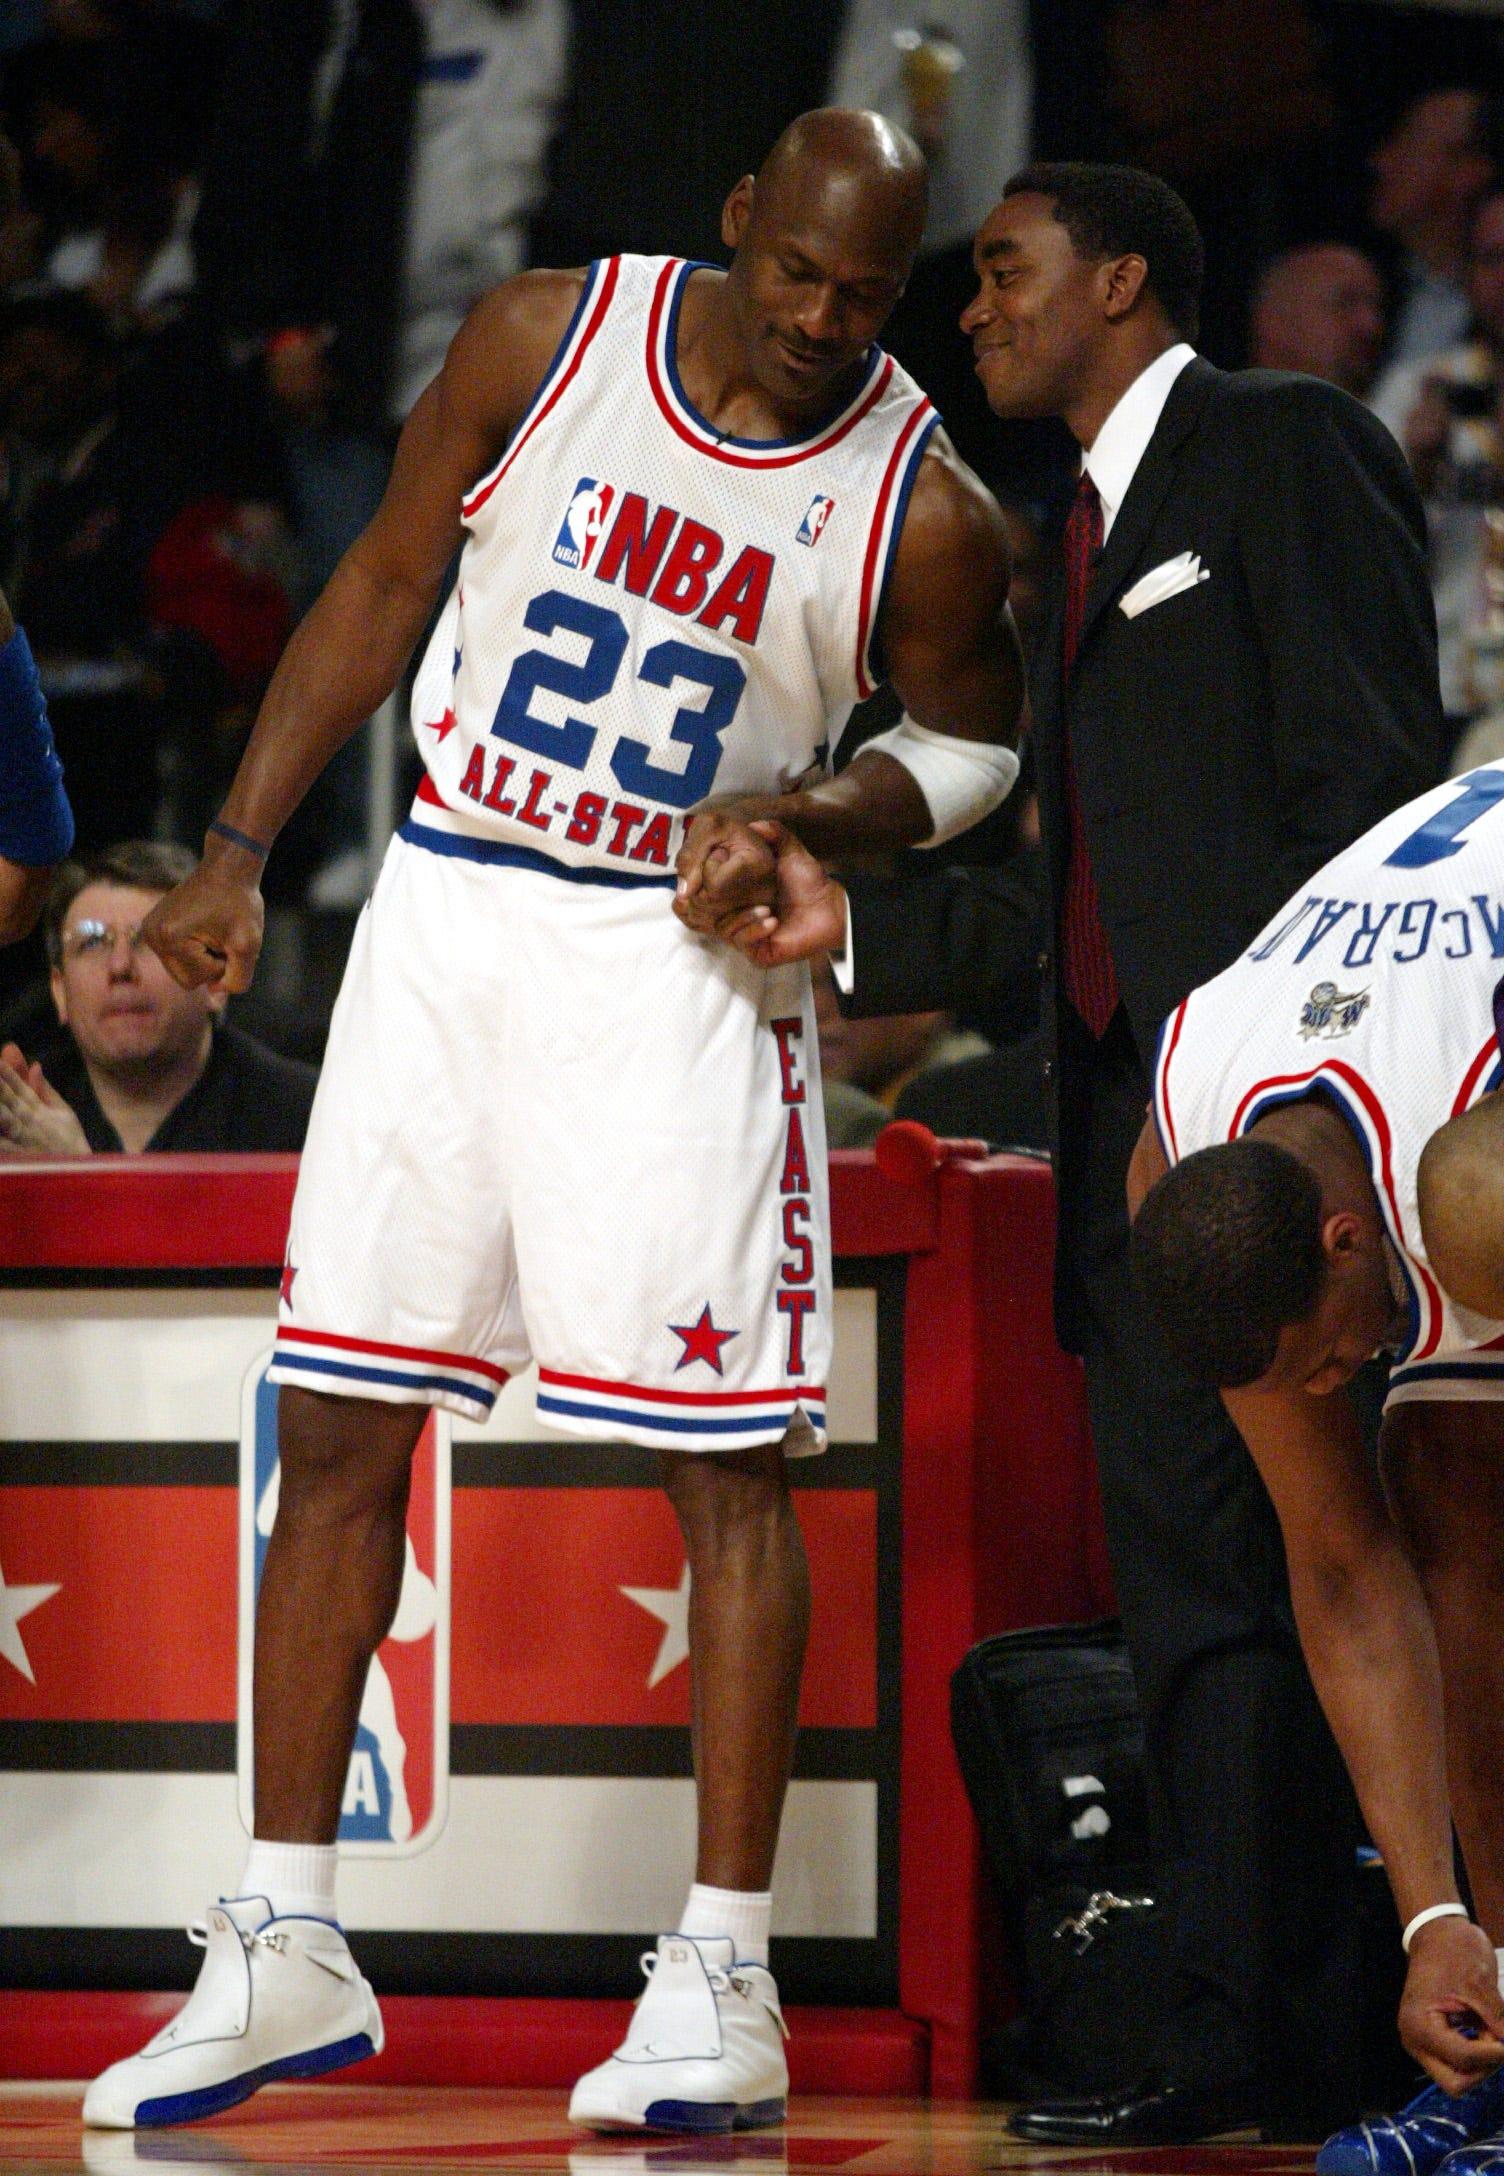 Michael Jordan recording: 'I won't play if Isiah Thomas is on' 1992 Dream Team